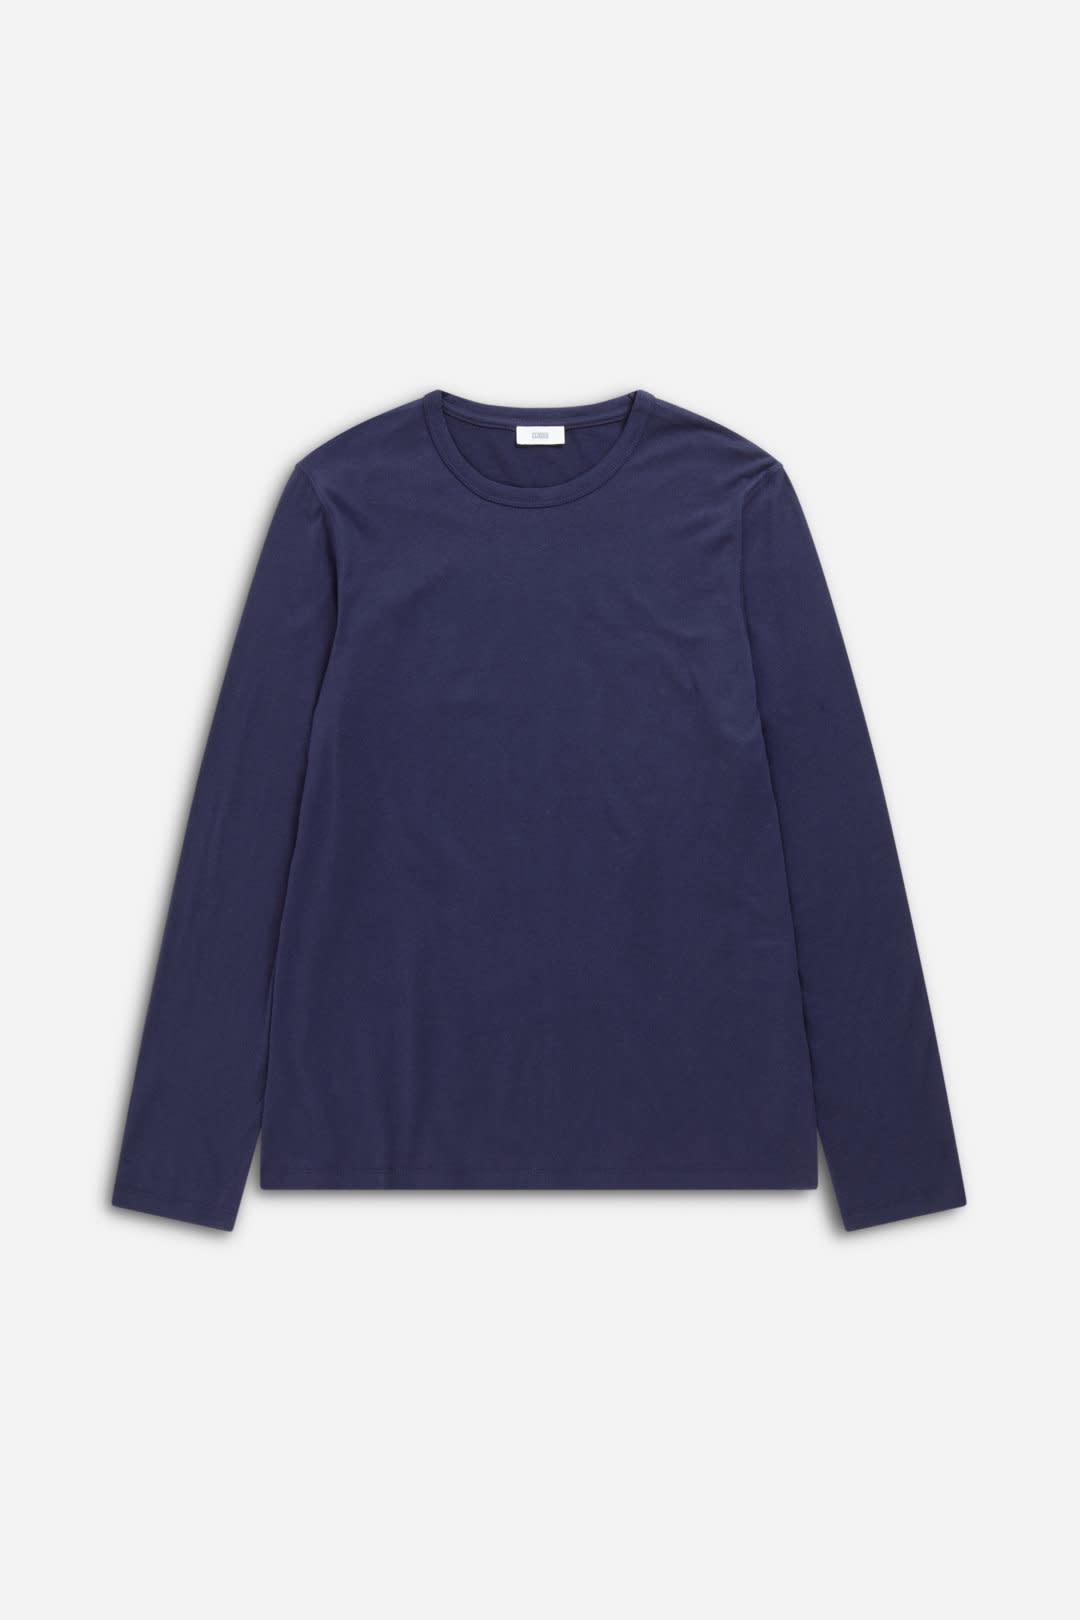 Cotton cashmere longsleeve dark night-1